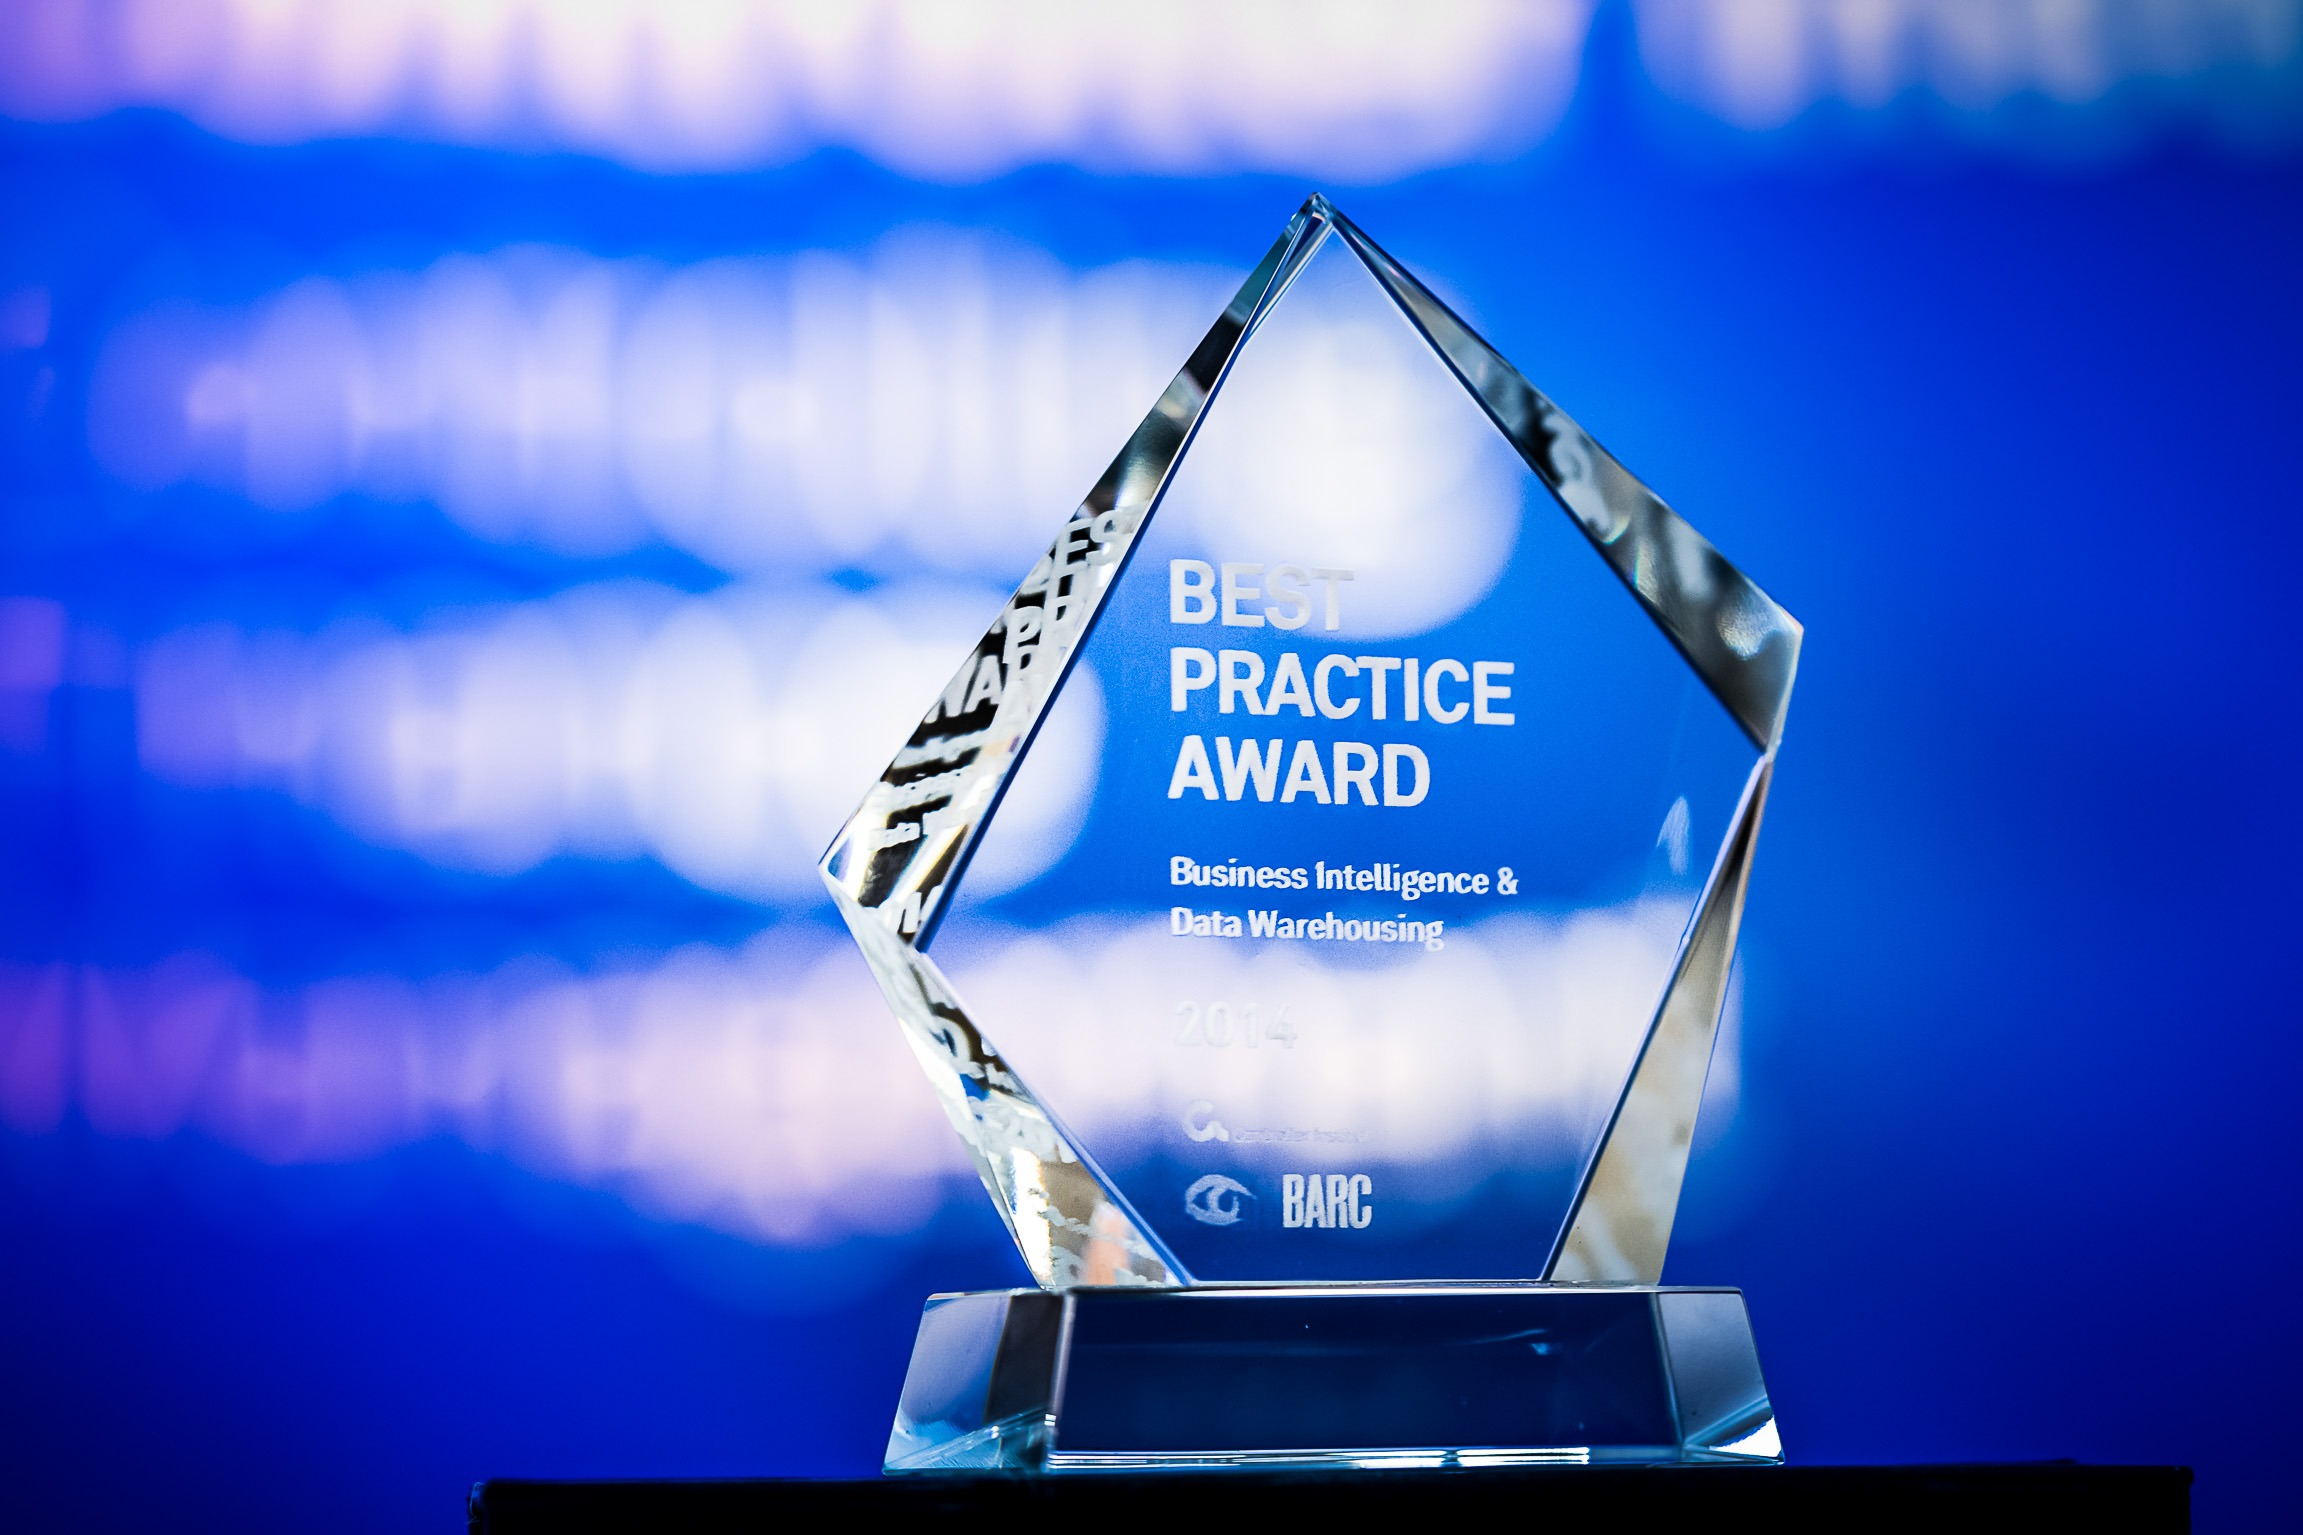 Bild der Trophäe des Best Practise Awards 2017 der ÖCI-BARC Tagung